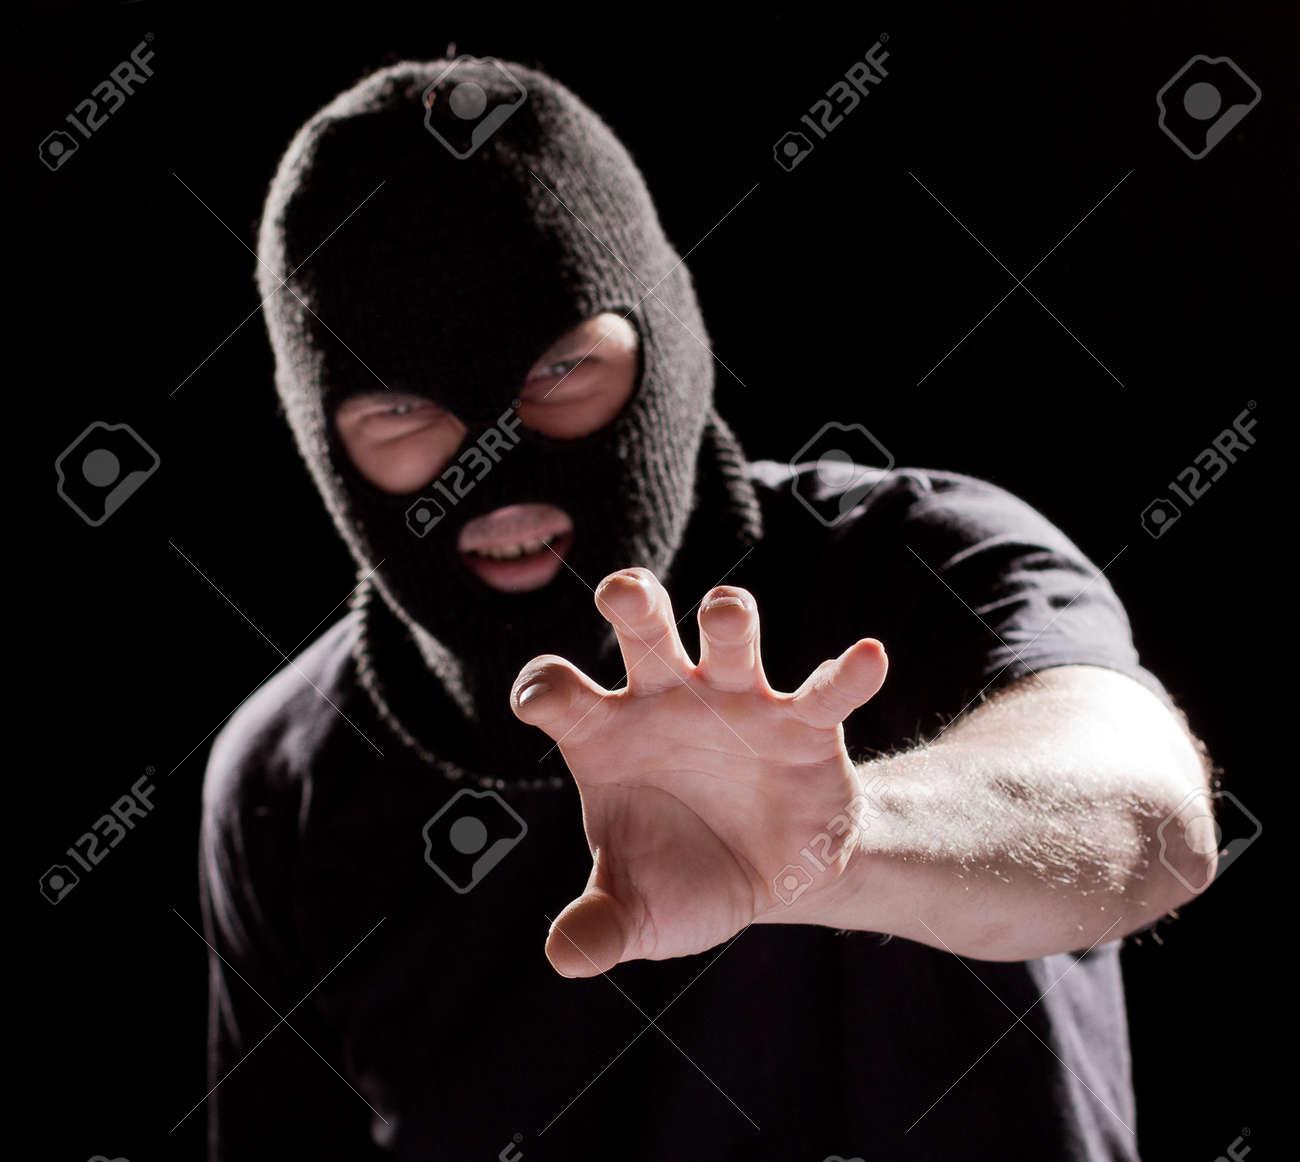 Burglar in mask, robbing and catching something by hand Stock Photo - 10834661